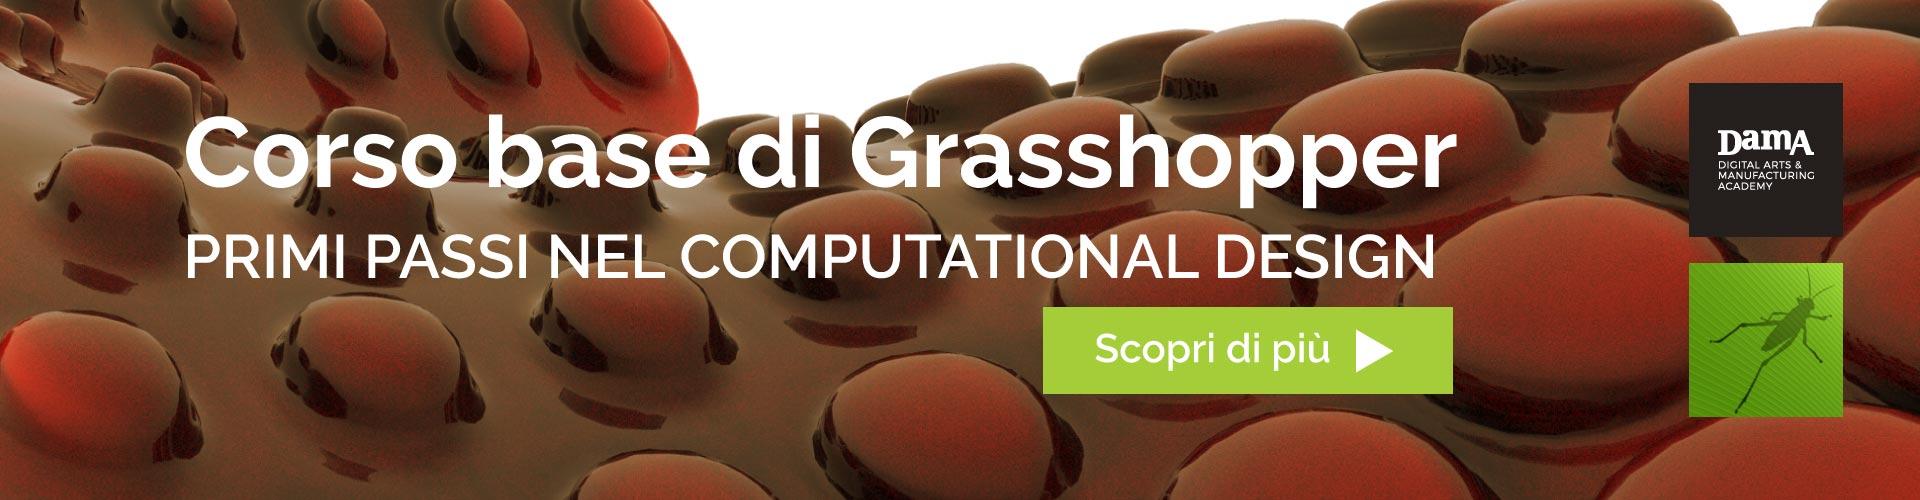 Grasshopper - corso base di computational design